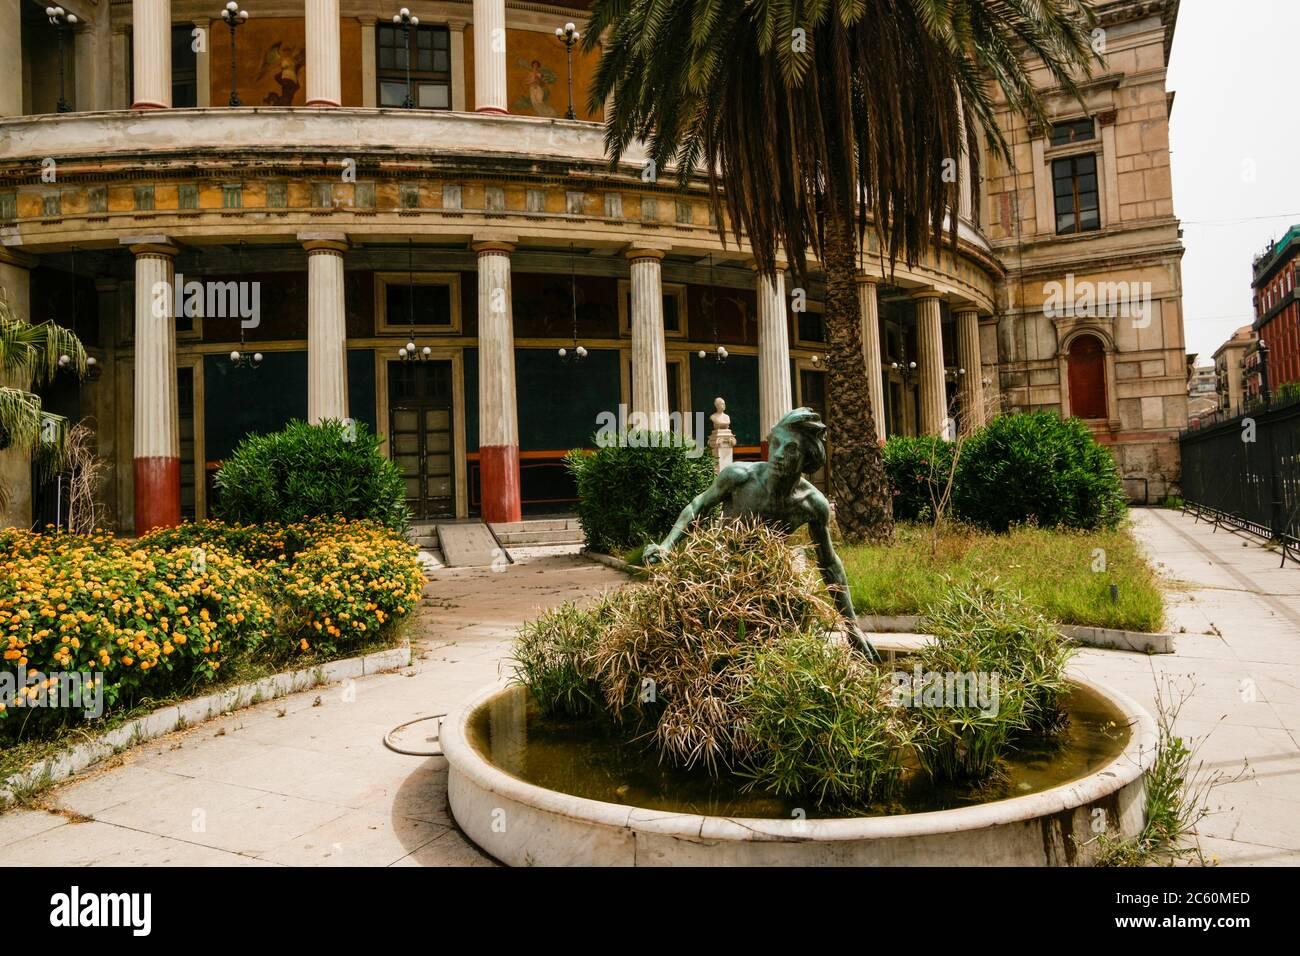 Politeama-Garibaldi Theater (Teatro Politeama-Garibaldi), Piazza Ruggero Settimo, Palermo, Sicily, Italy, Europe. Stock Photo